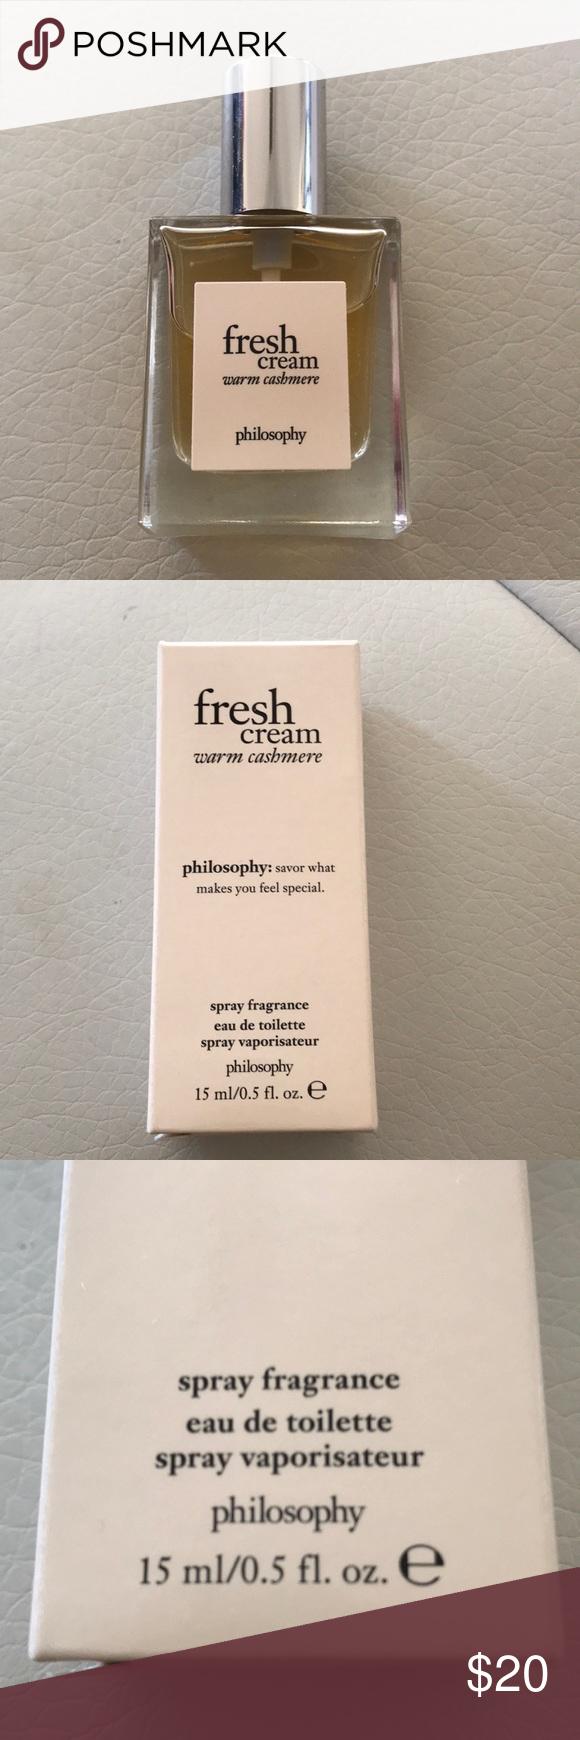 Philosophy Fresh Cream Nib Philosophy Fresh Cream Fresh Cream Cream